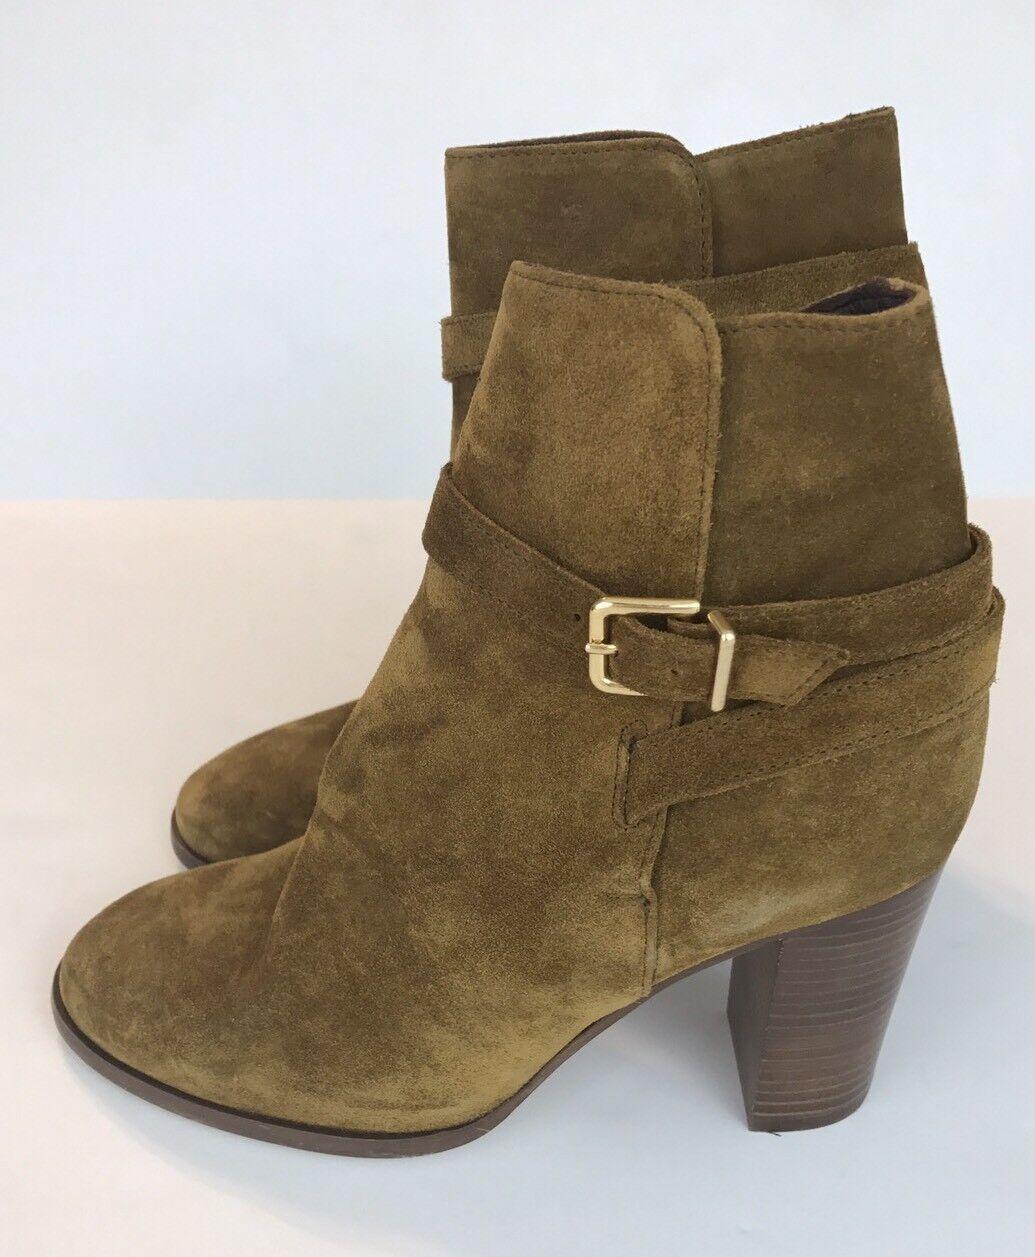 New J.CREW Suede Ankle Stivali with Wraparound Buckle F8008 Brown Size 7